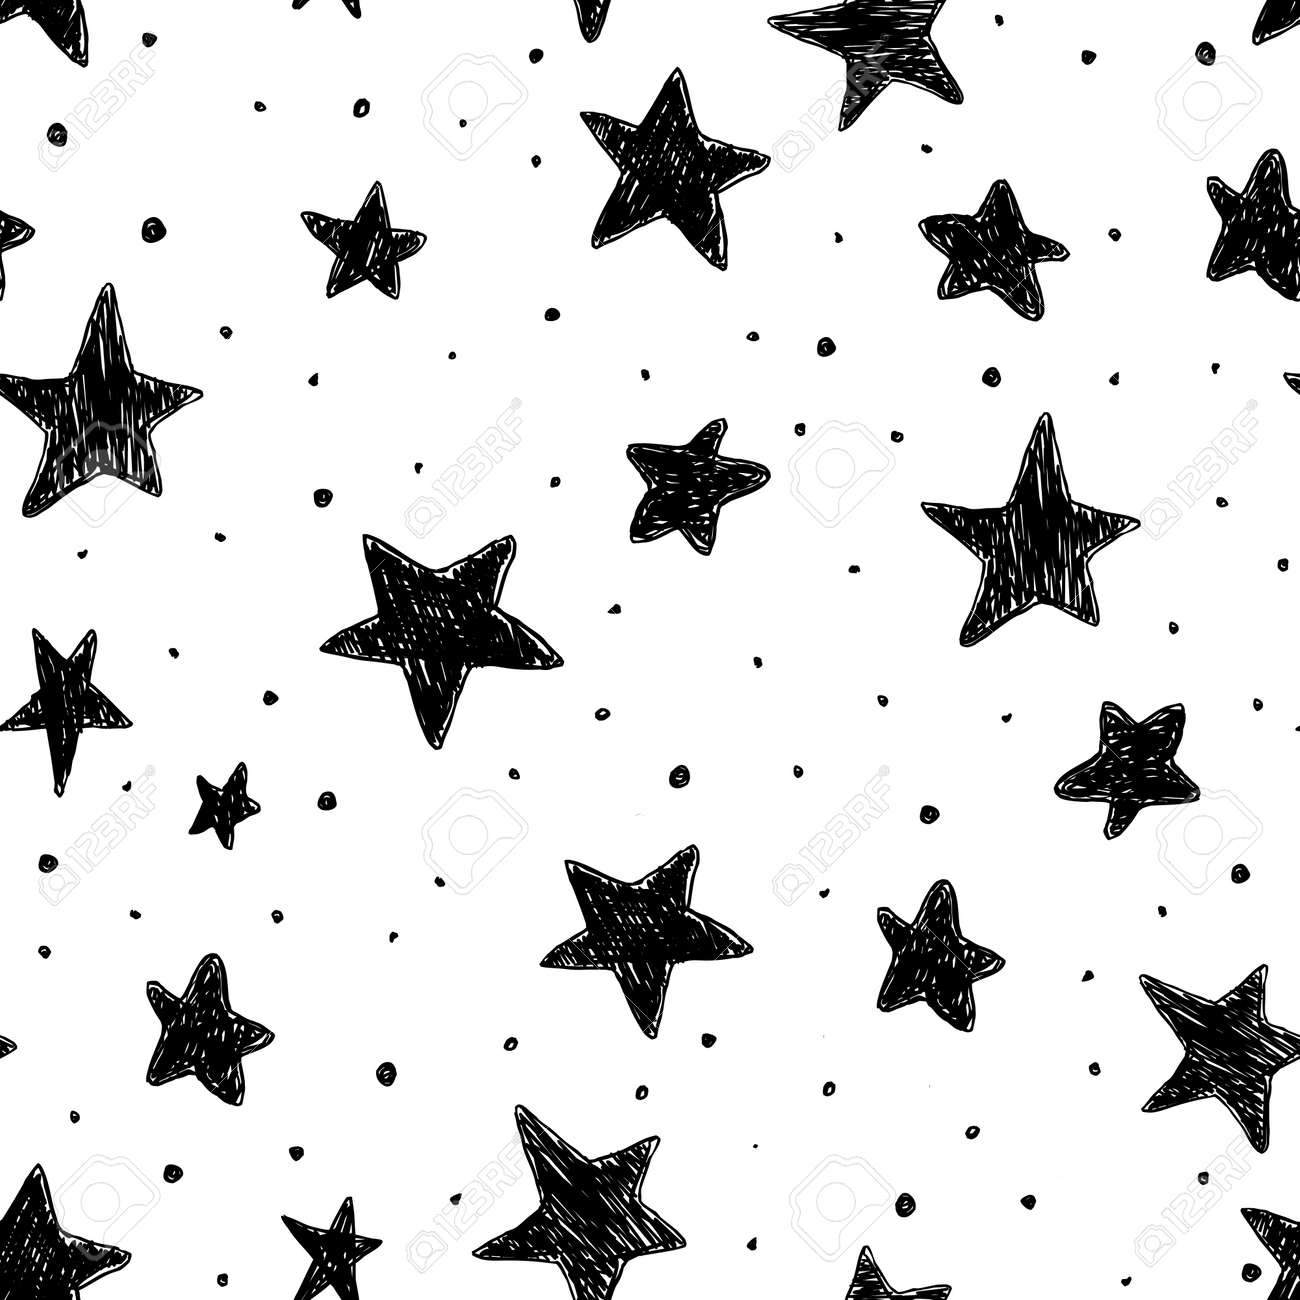 Beautiful monohrome black and white seamless sky pattern with